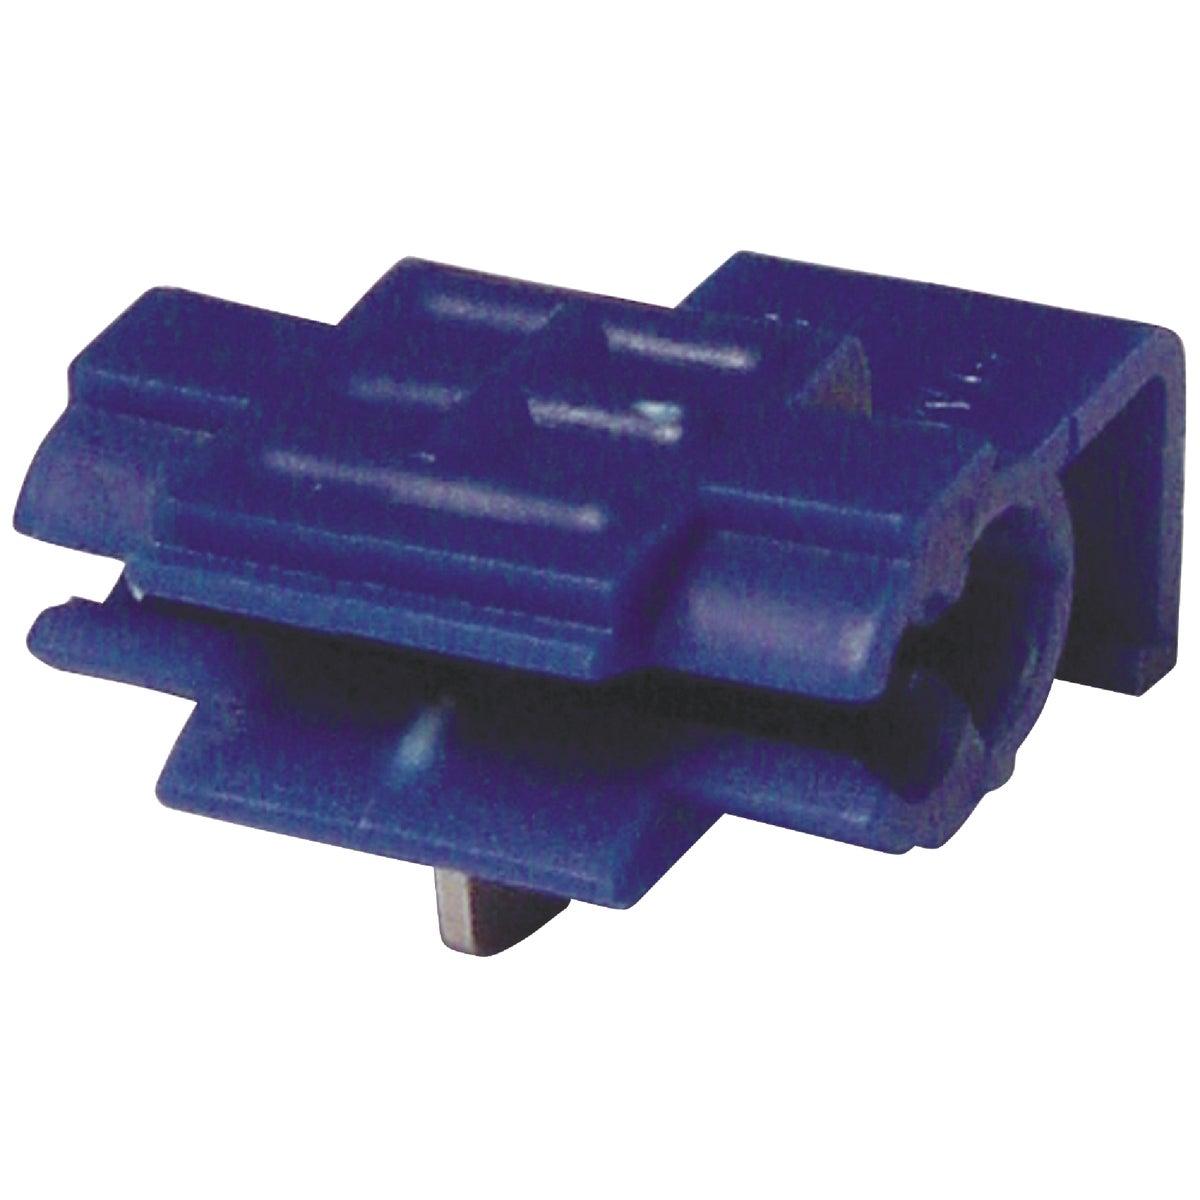 GB Electrical 16-14 QUICK SPLICE 10-100